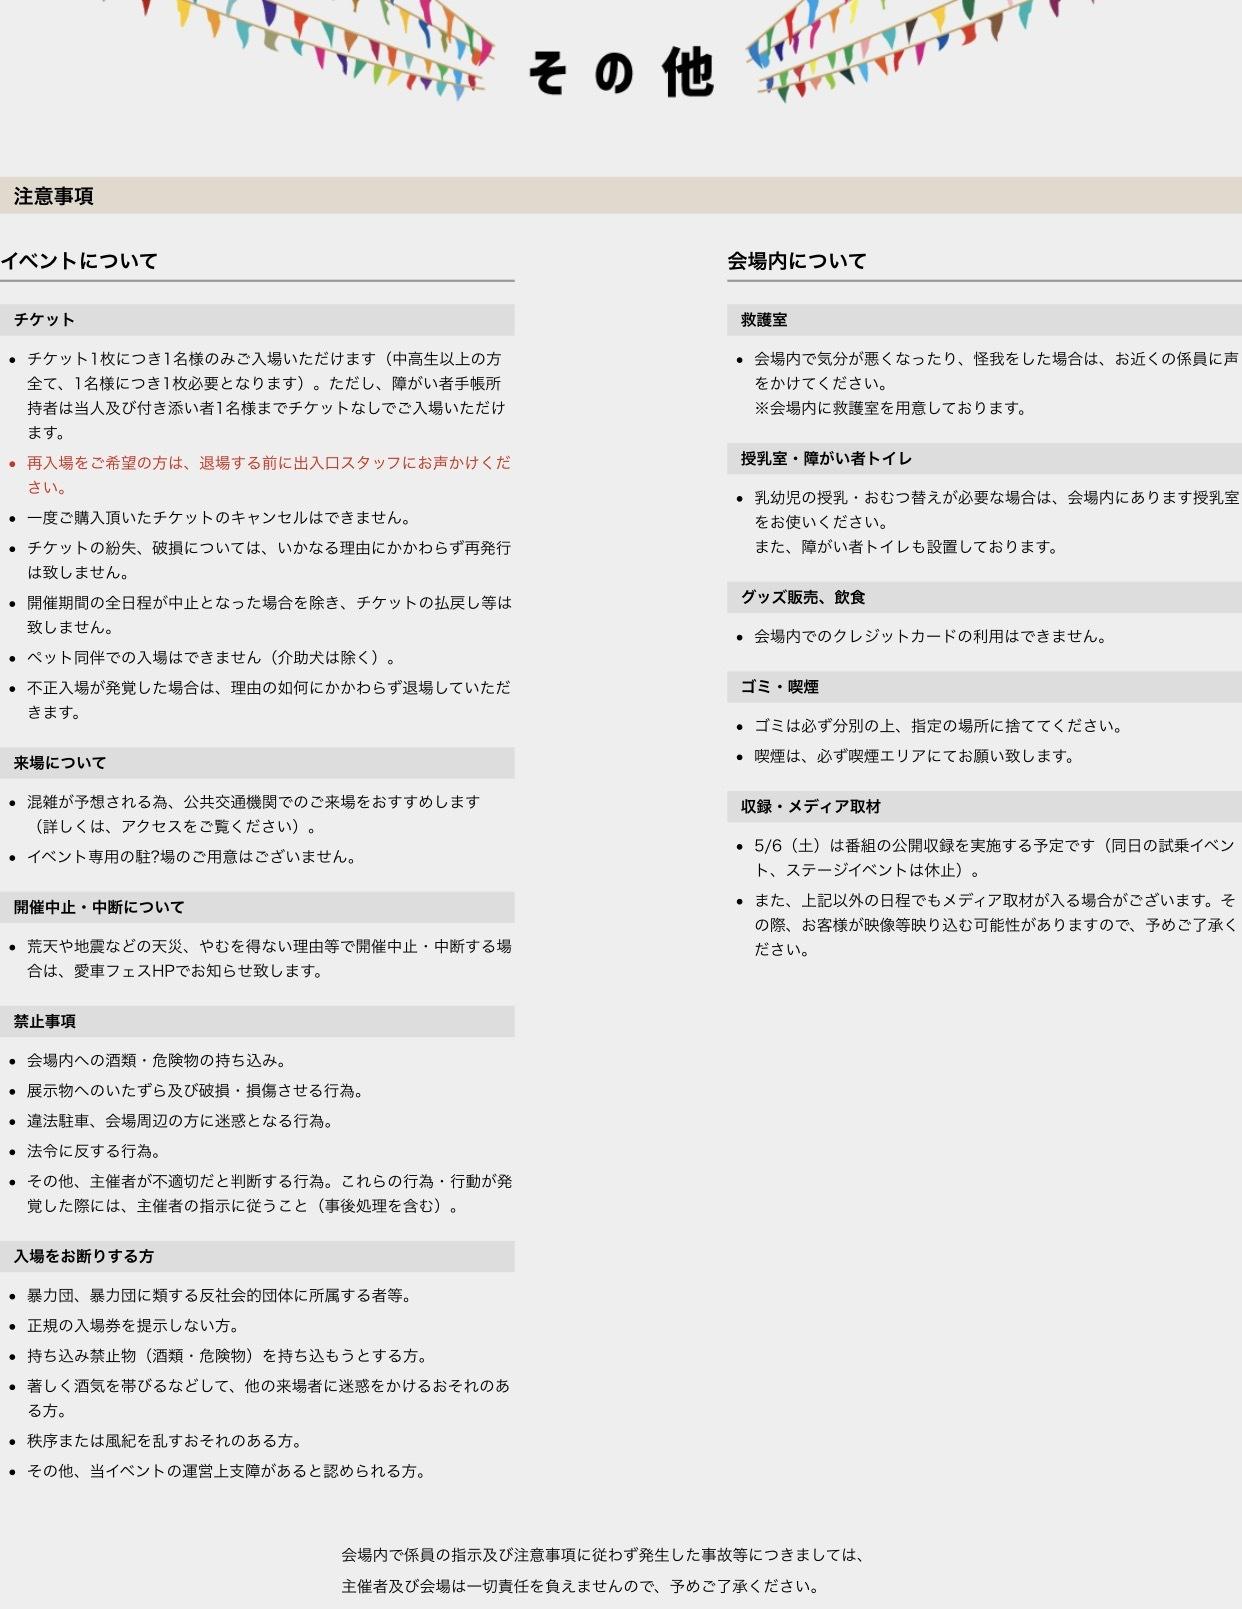 GO! GO! 5月!!  〜ライブスケジュール〜_f0115311_02344992.png